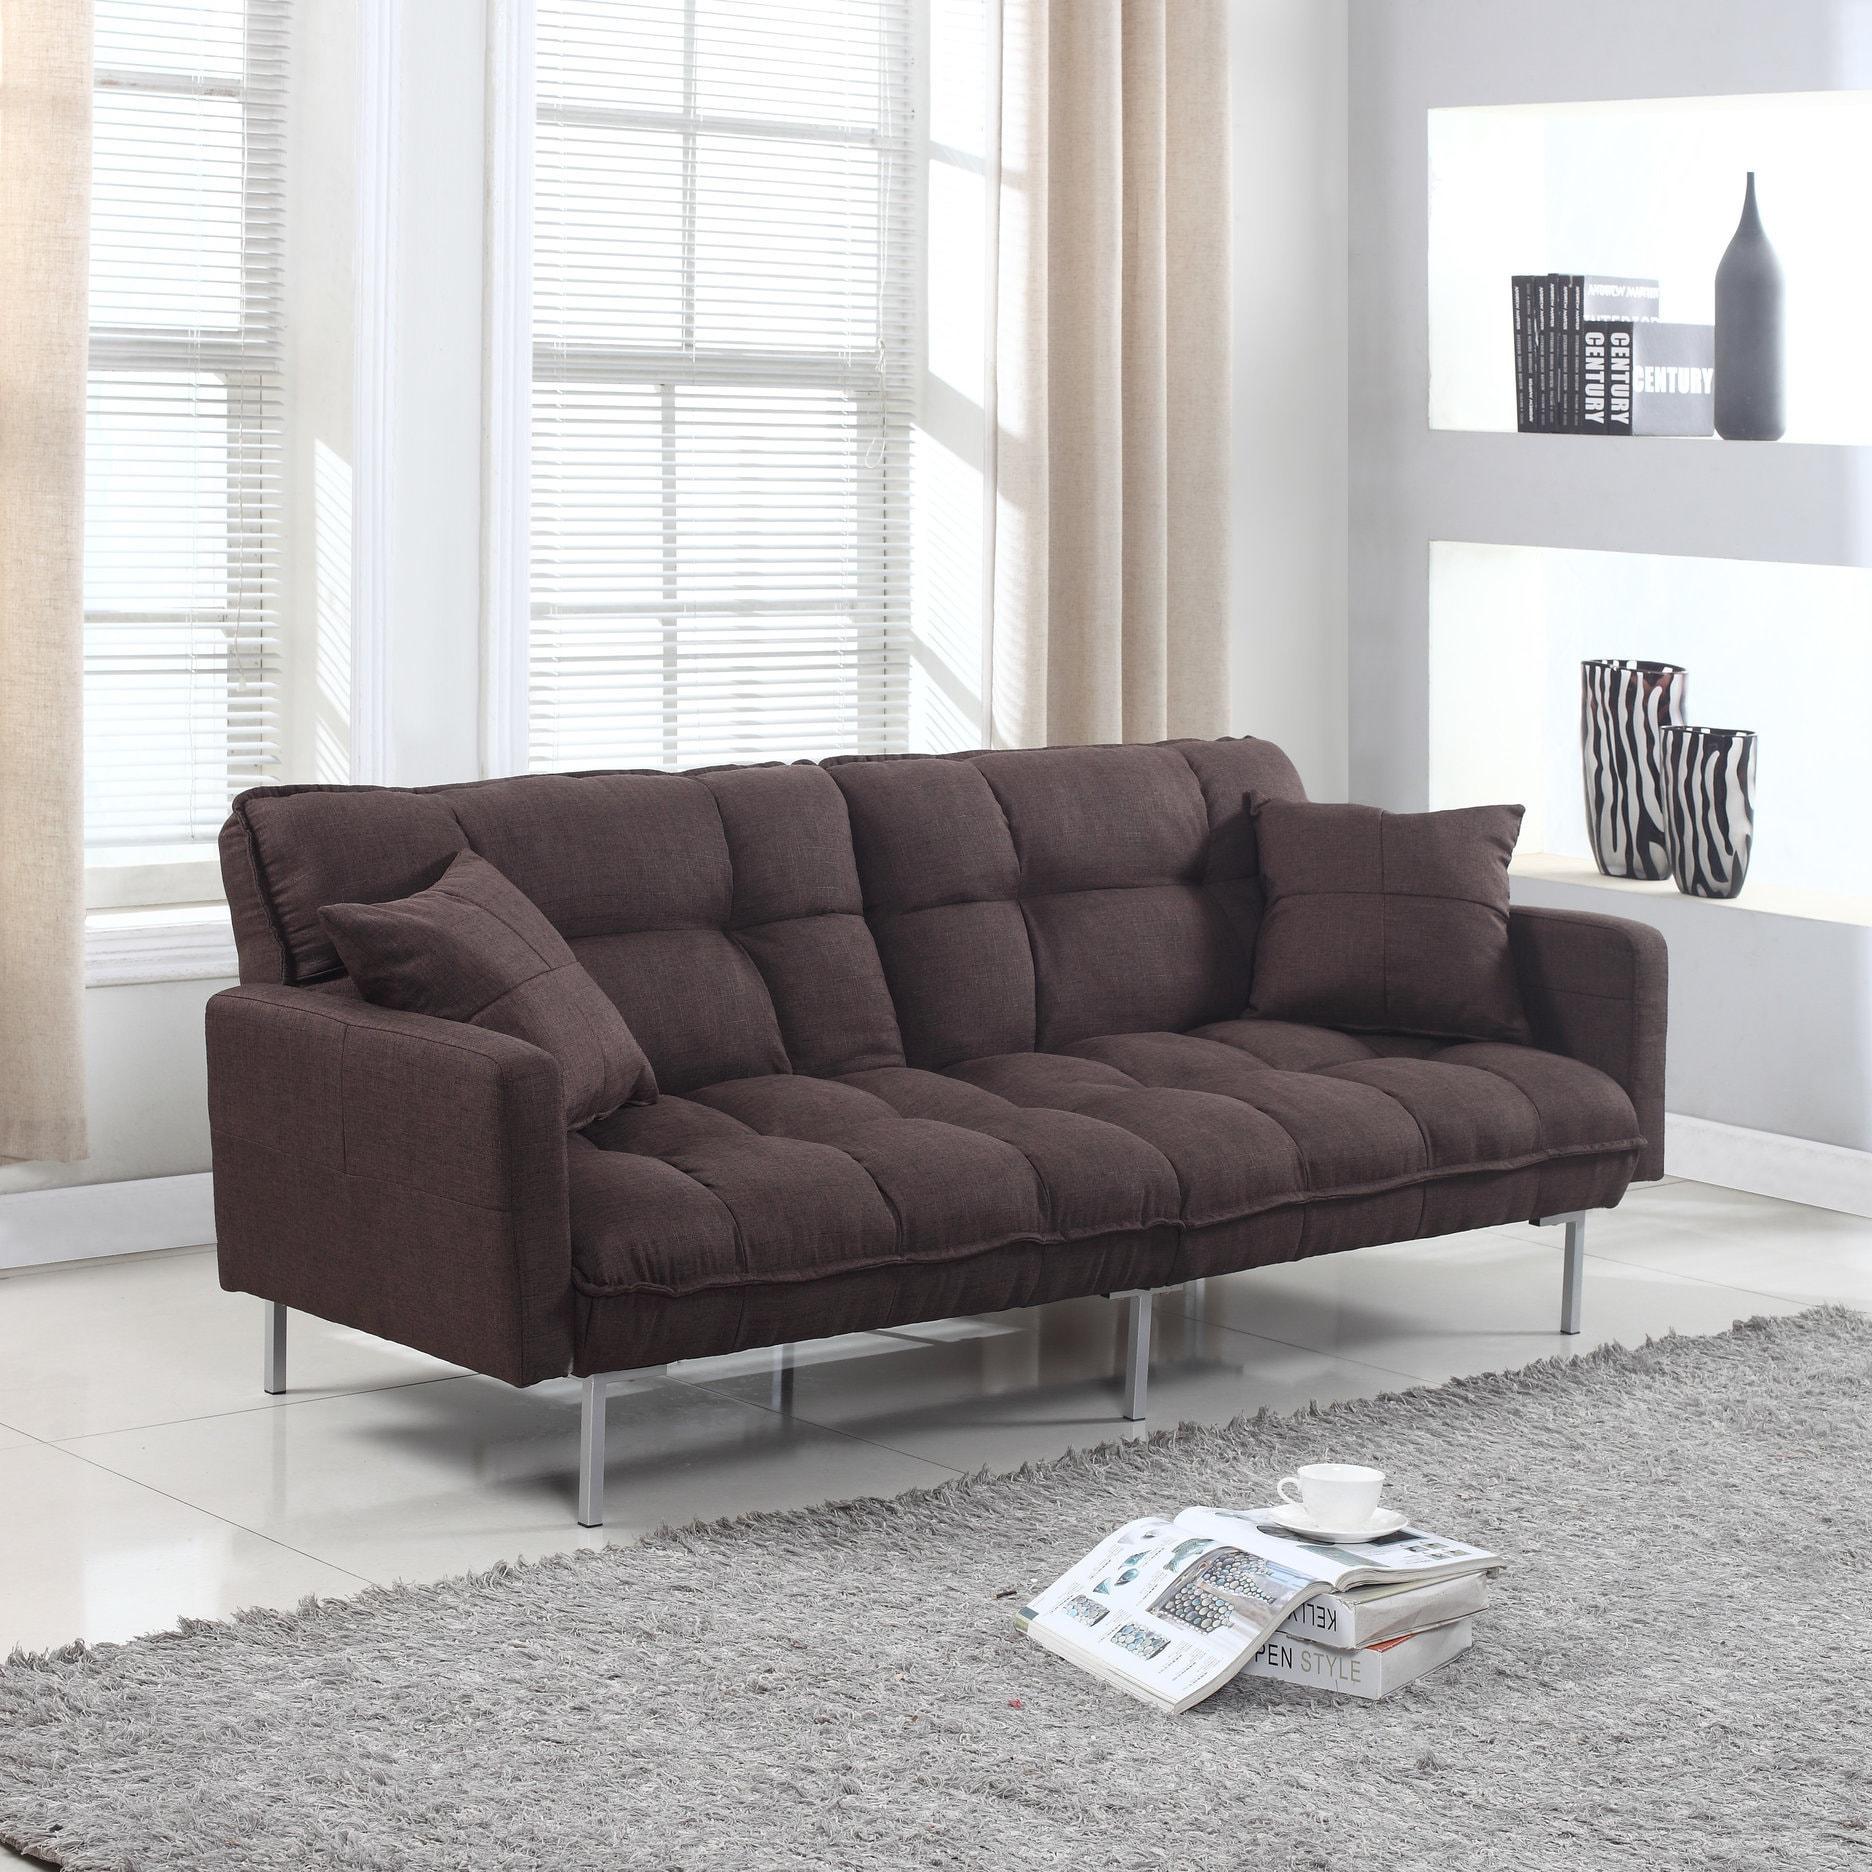 eden image right mattress choose sleeper futon of house small futons the loveseat